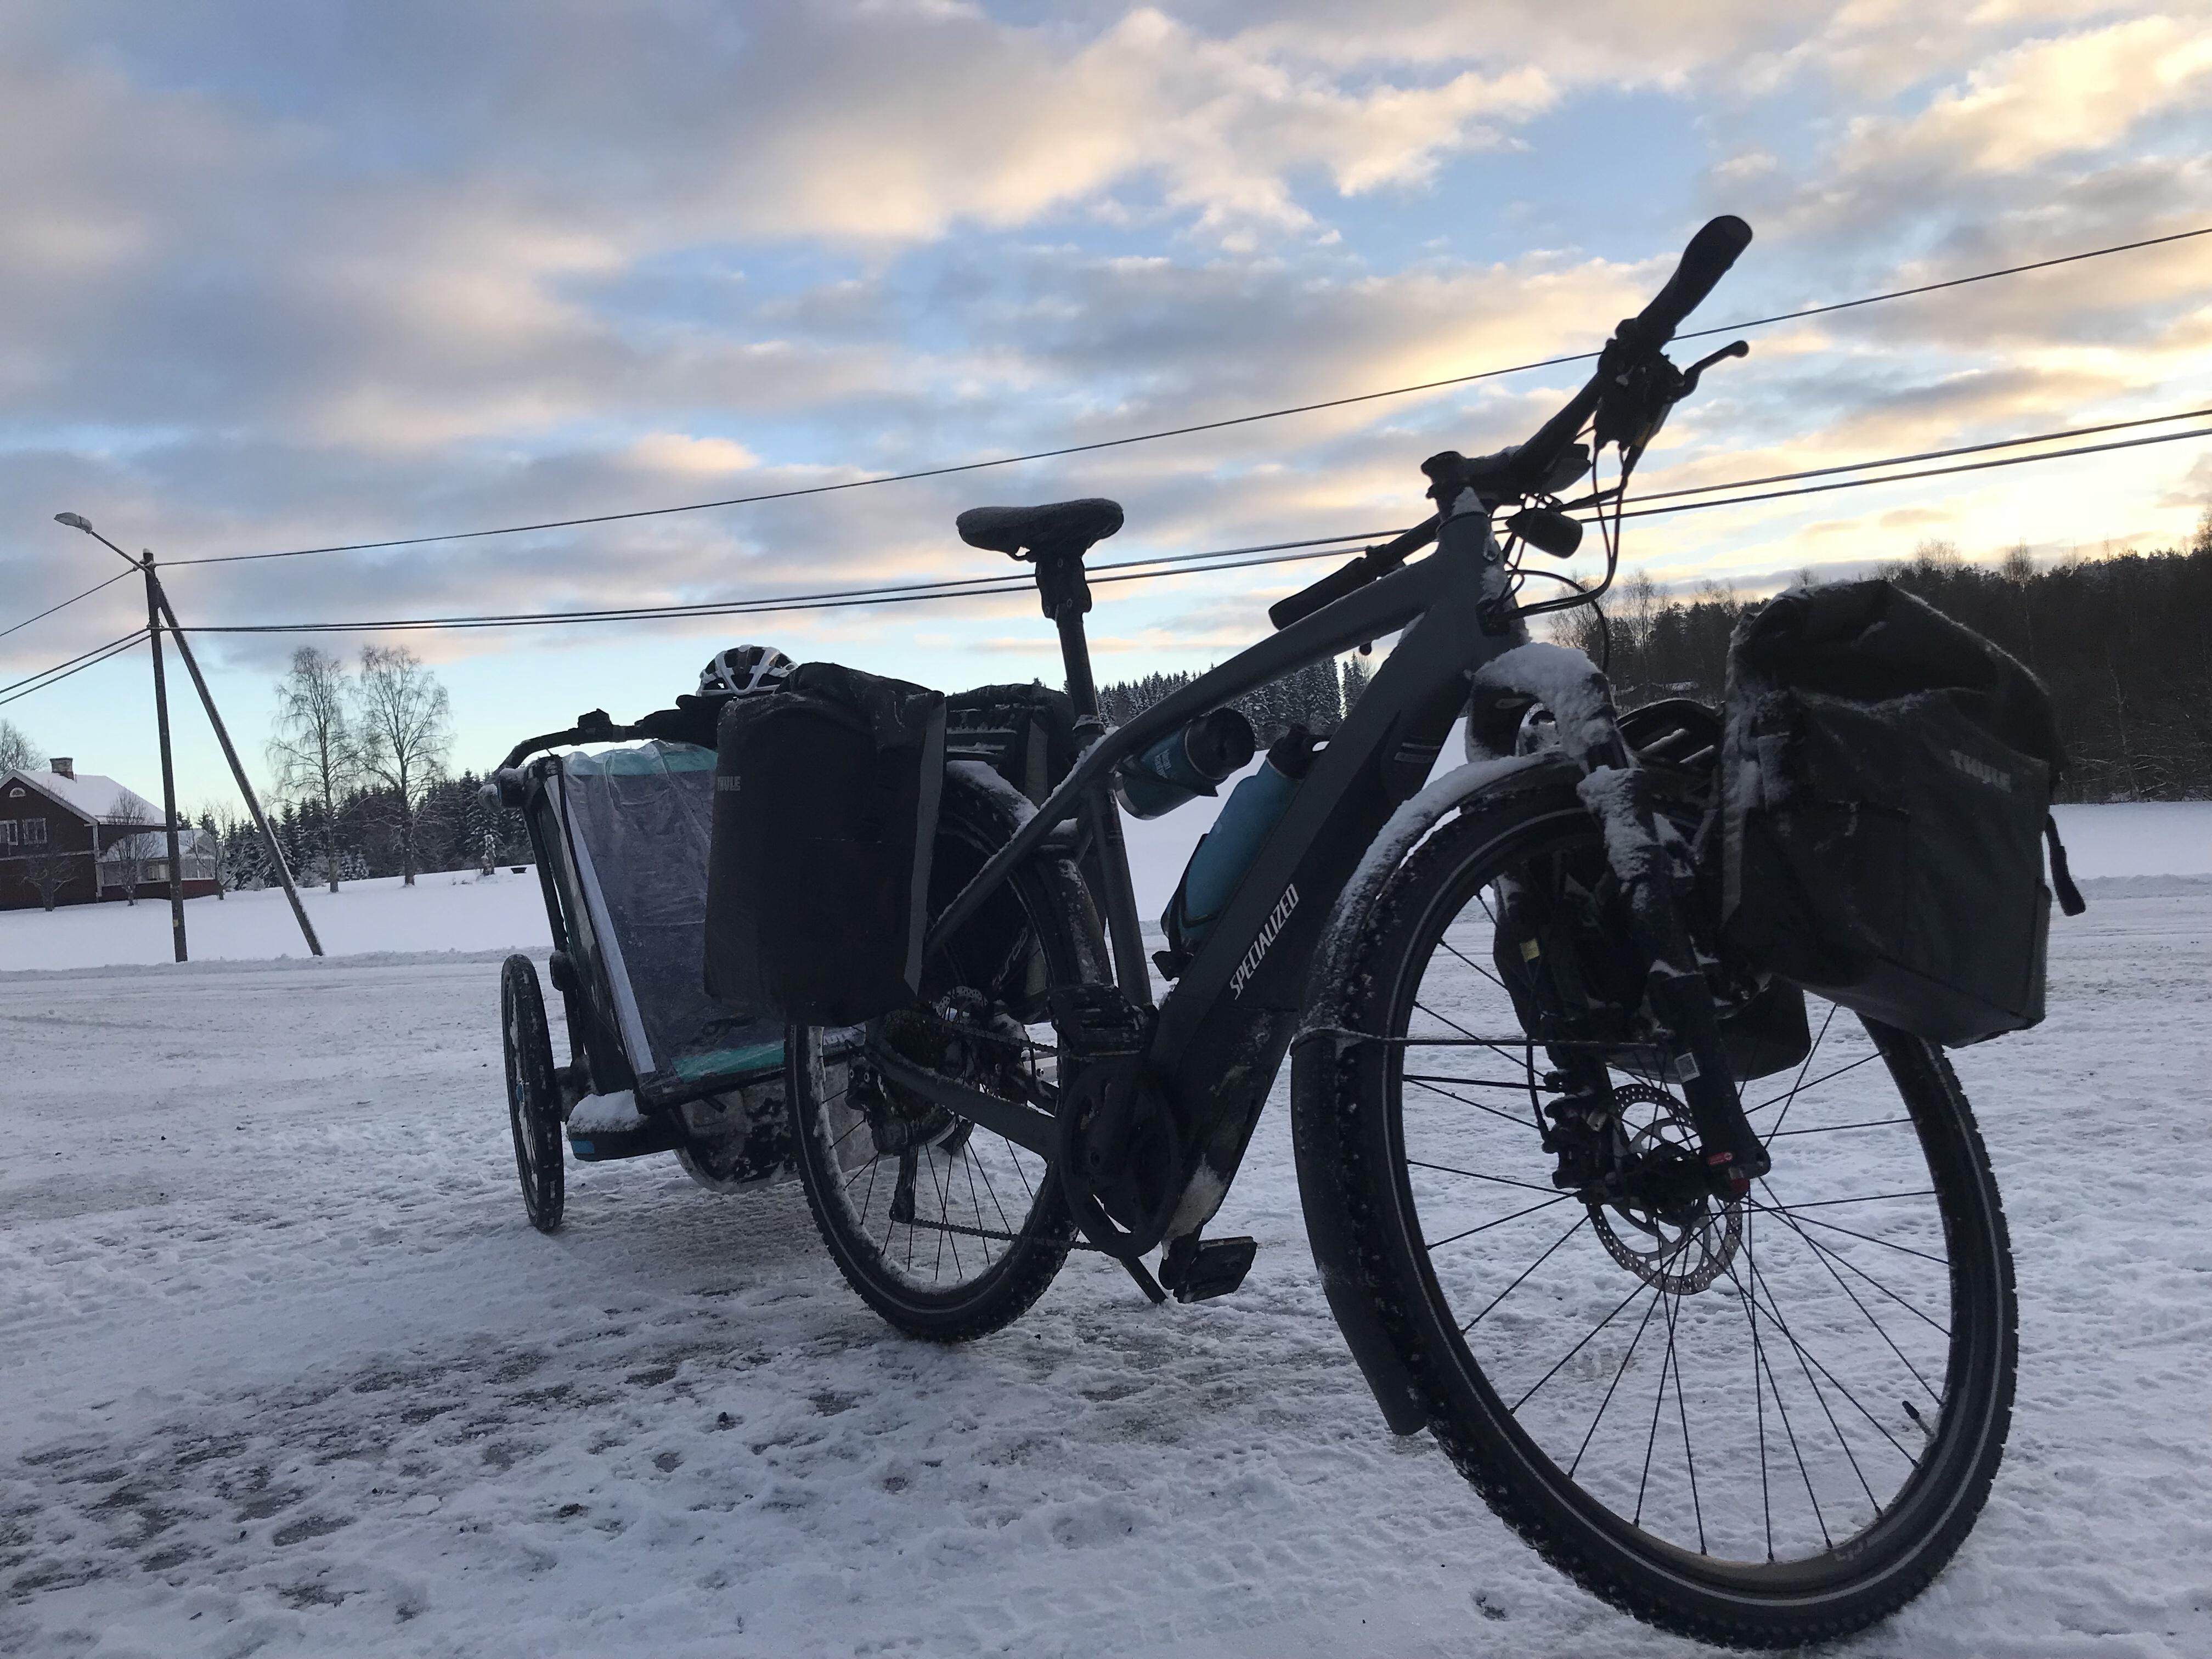 Epilog – Vintercykla Sveriges kustlinje